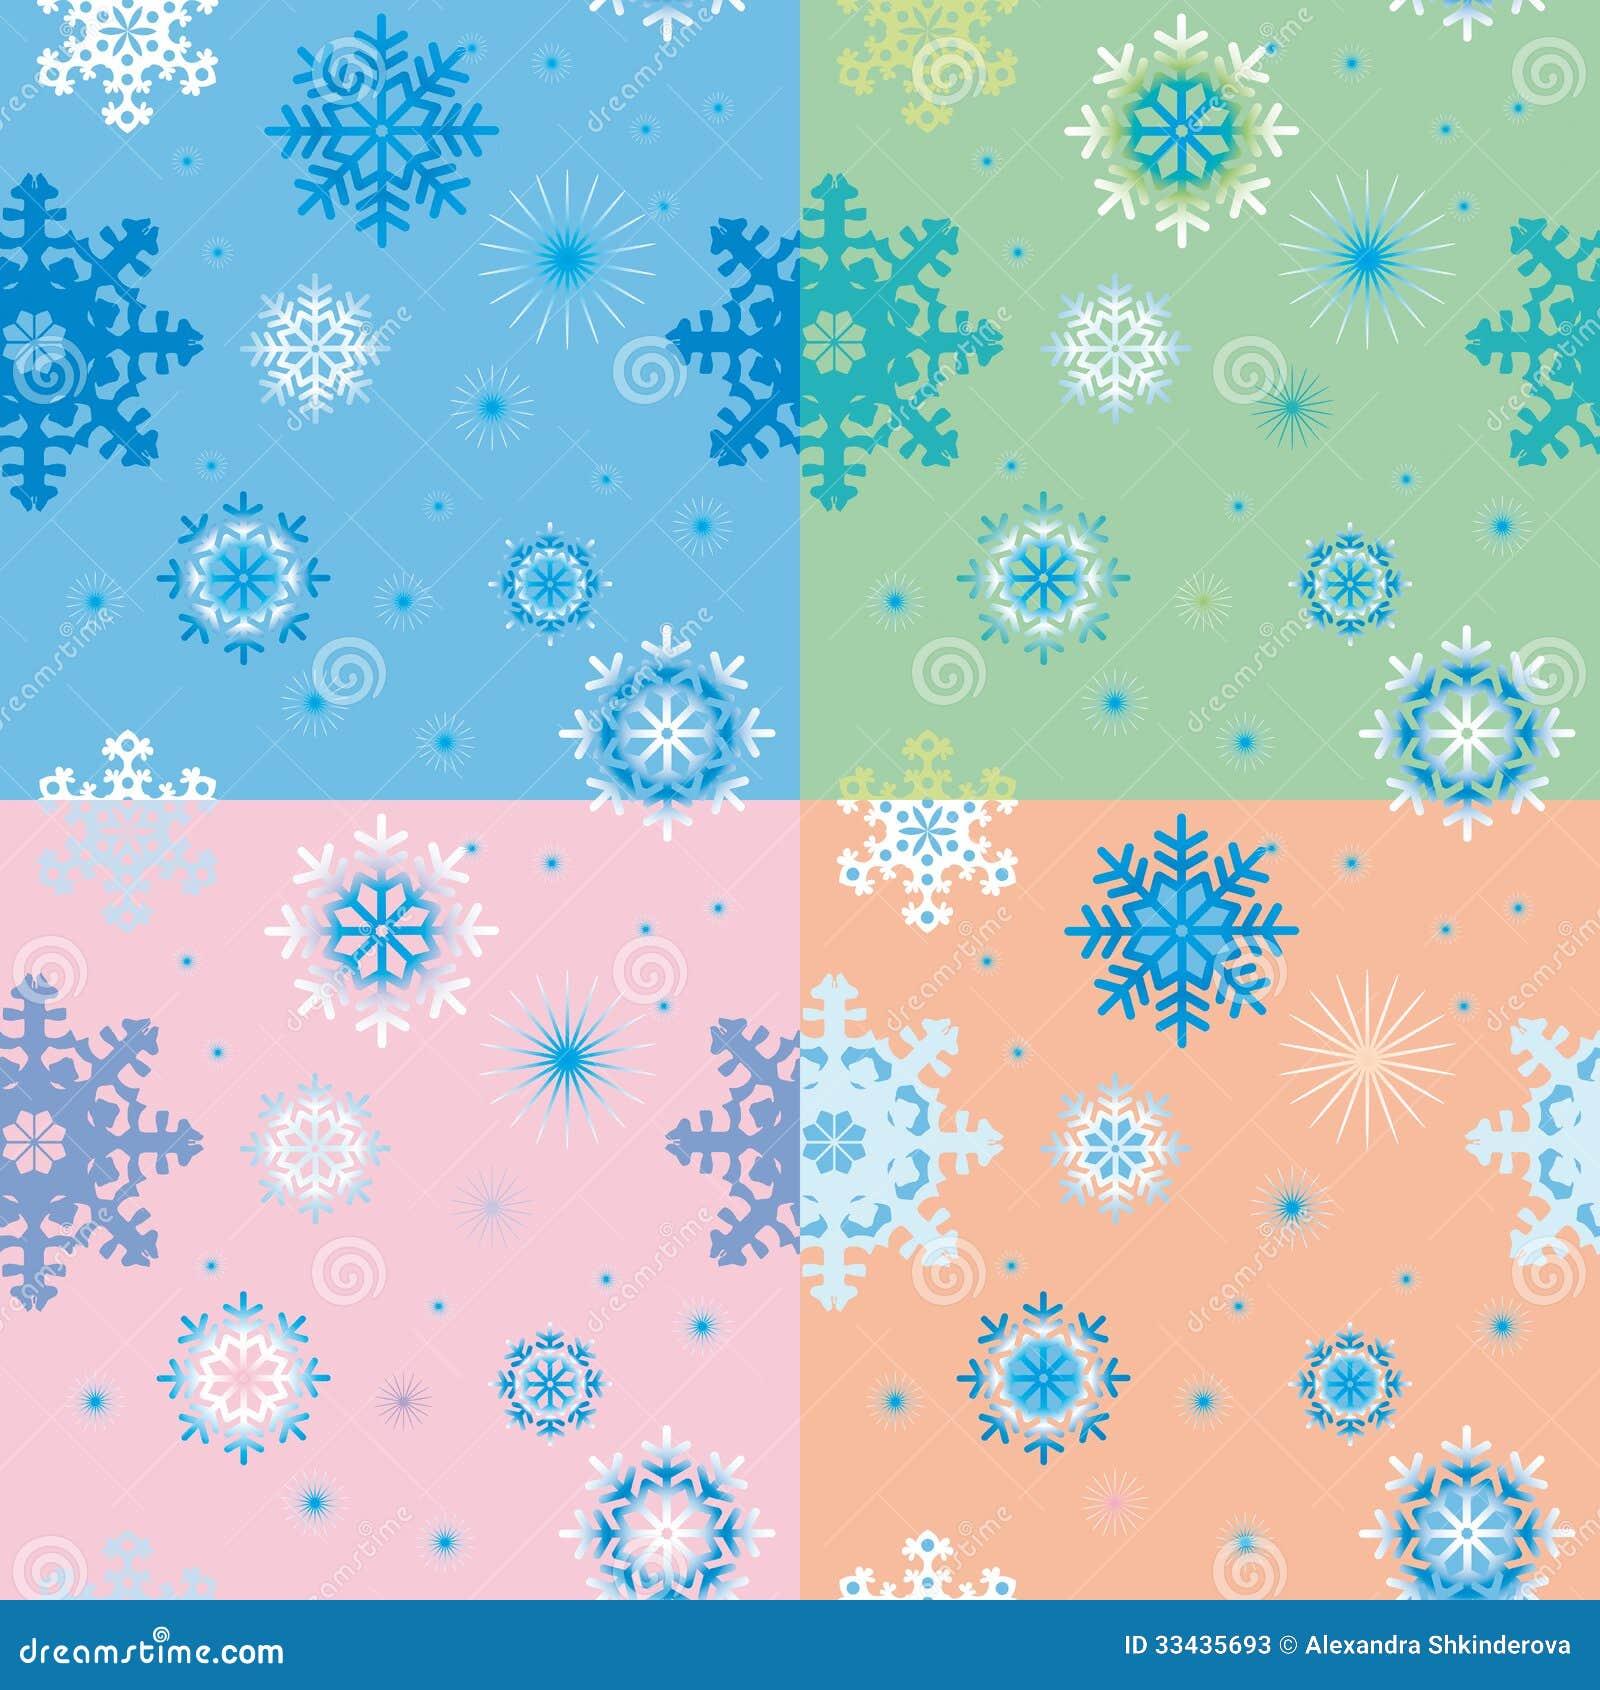 pastel snowflake wallpaper - photo #13